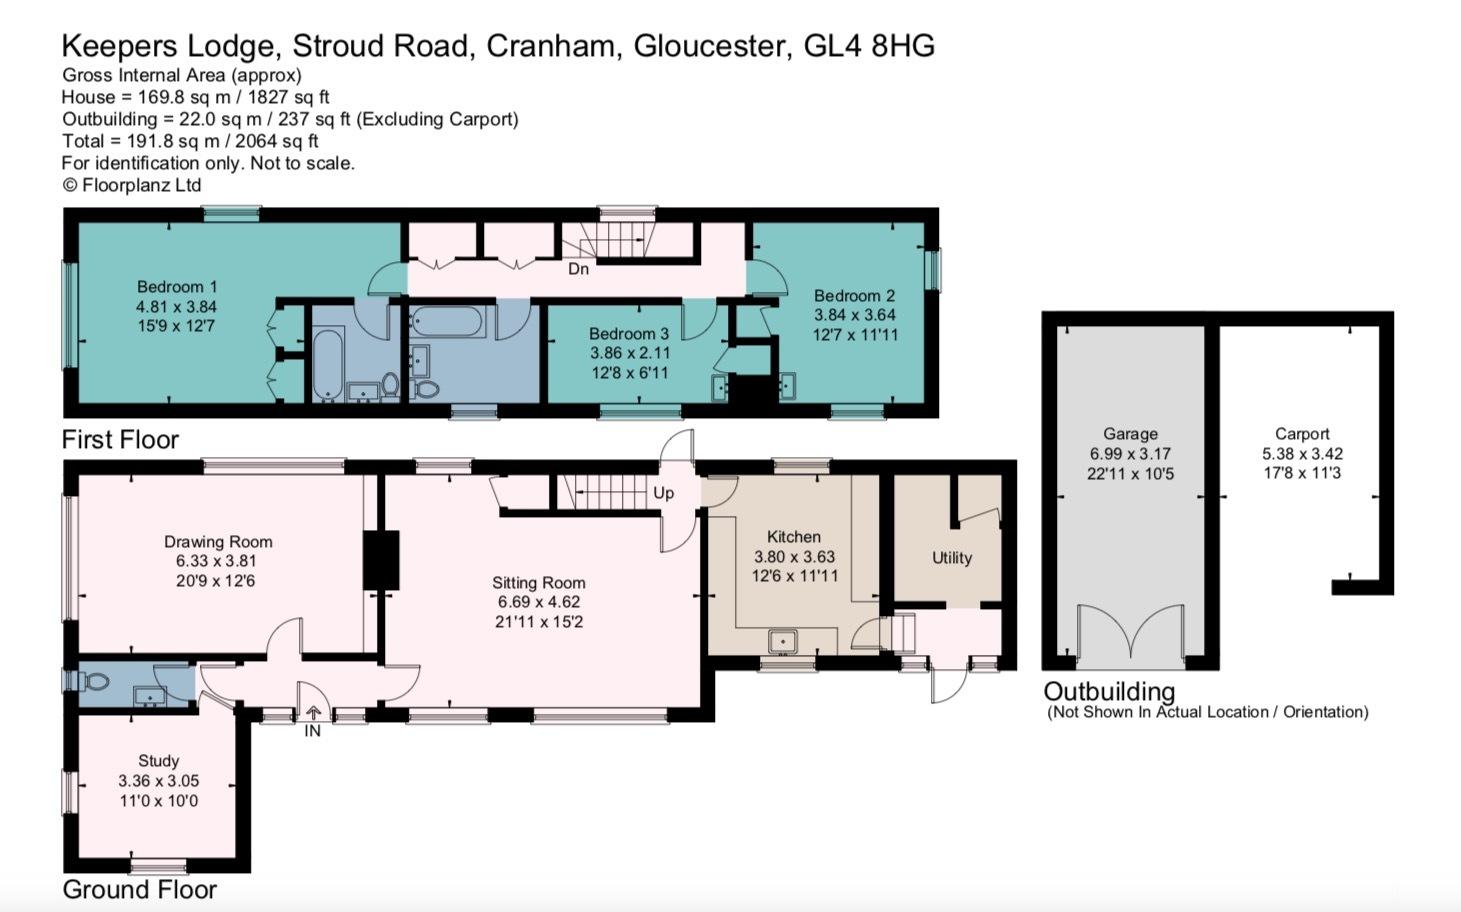 Keepers Lodge, Cranham, GL4 8HG - Sharvell Property